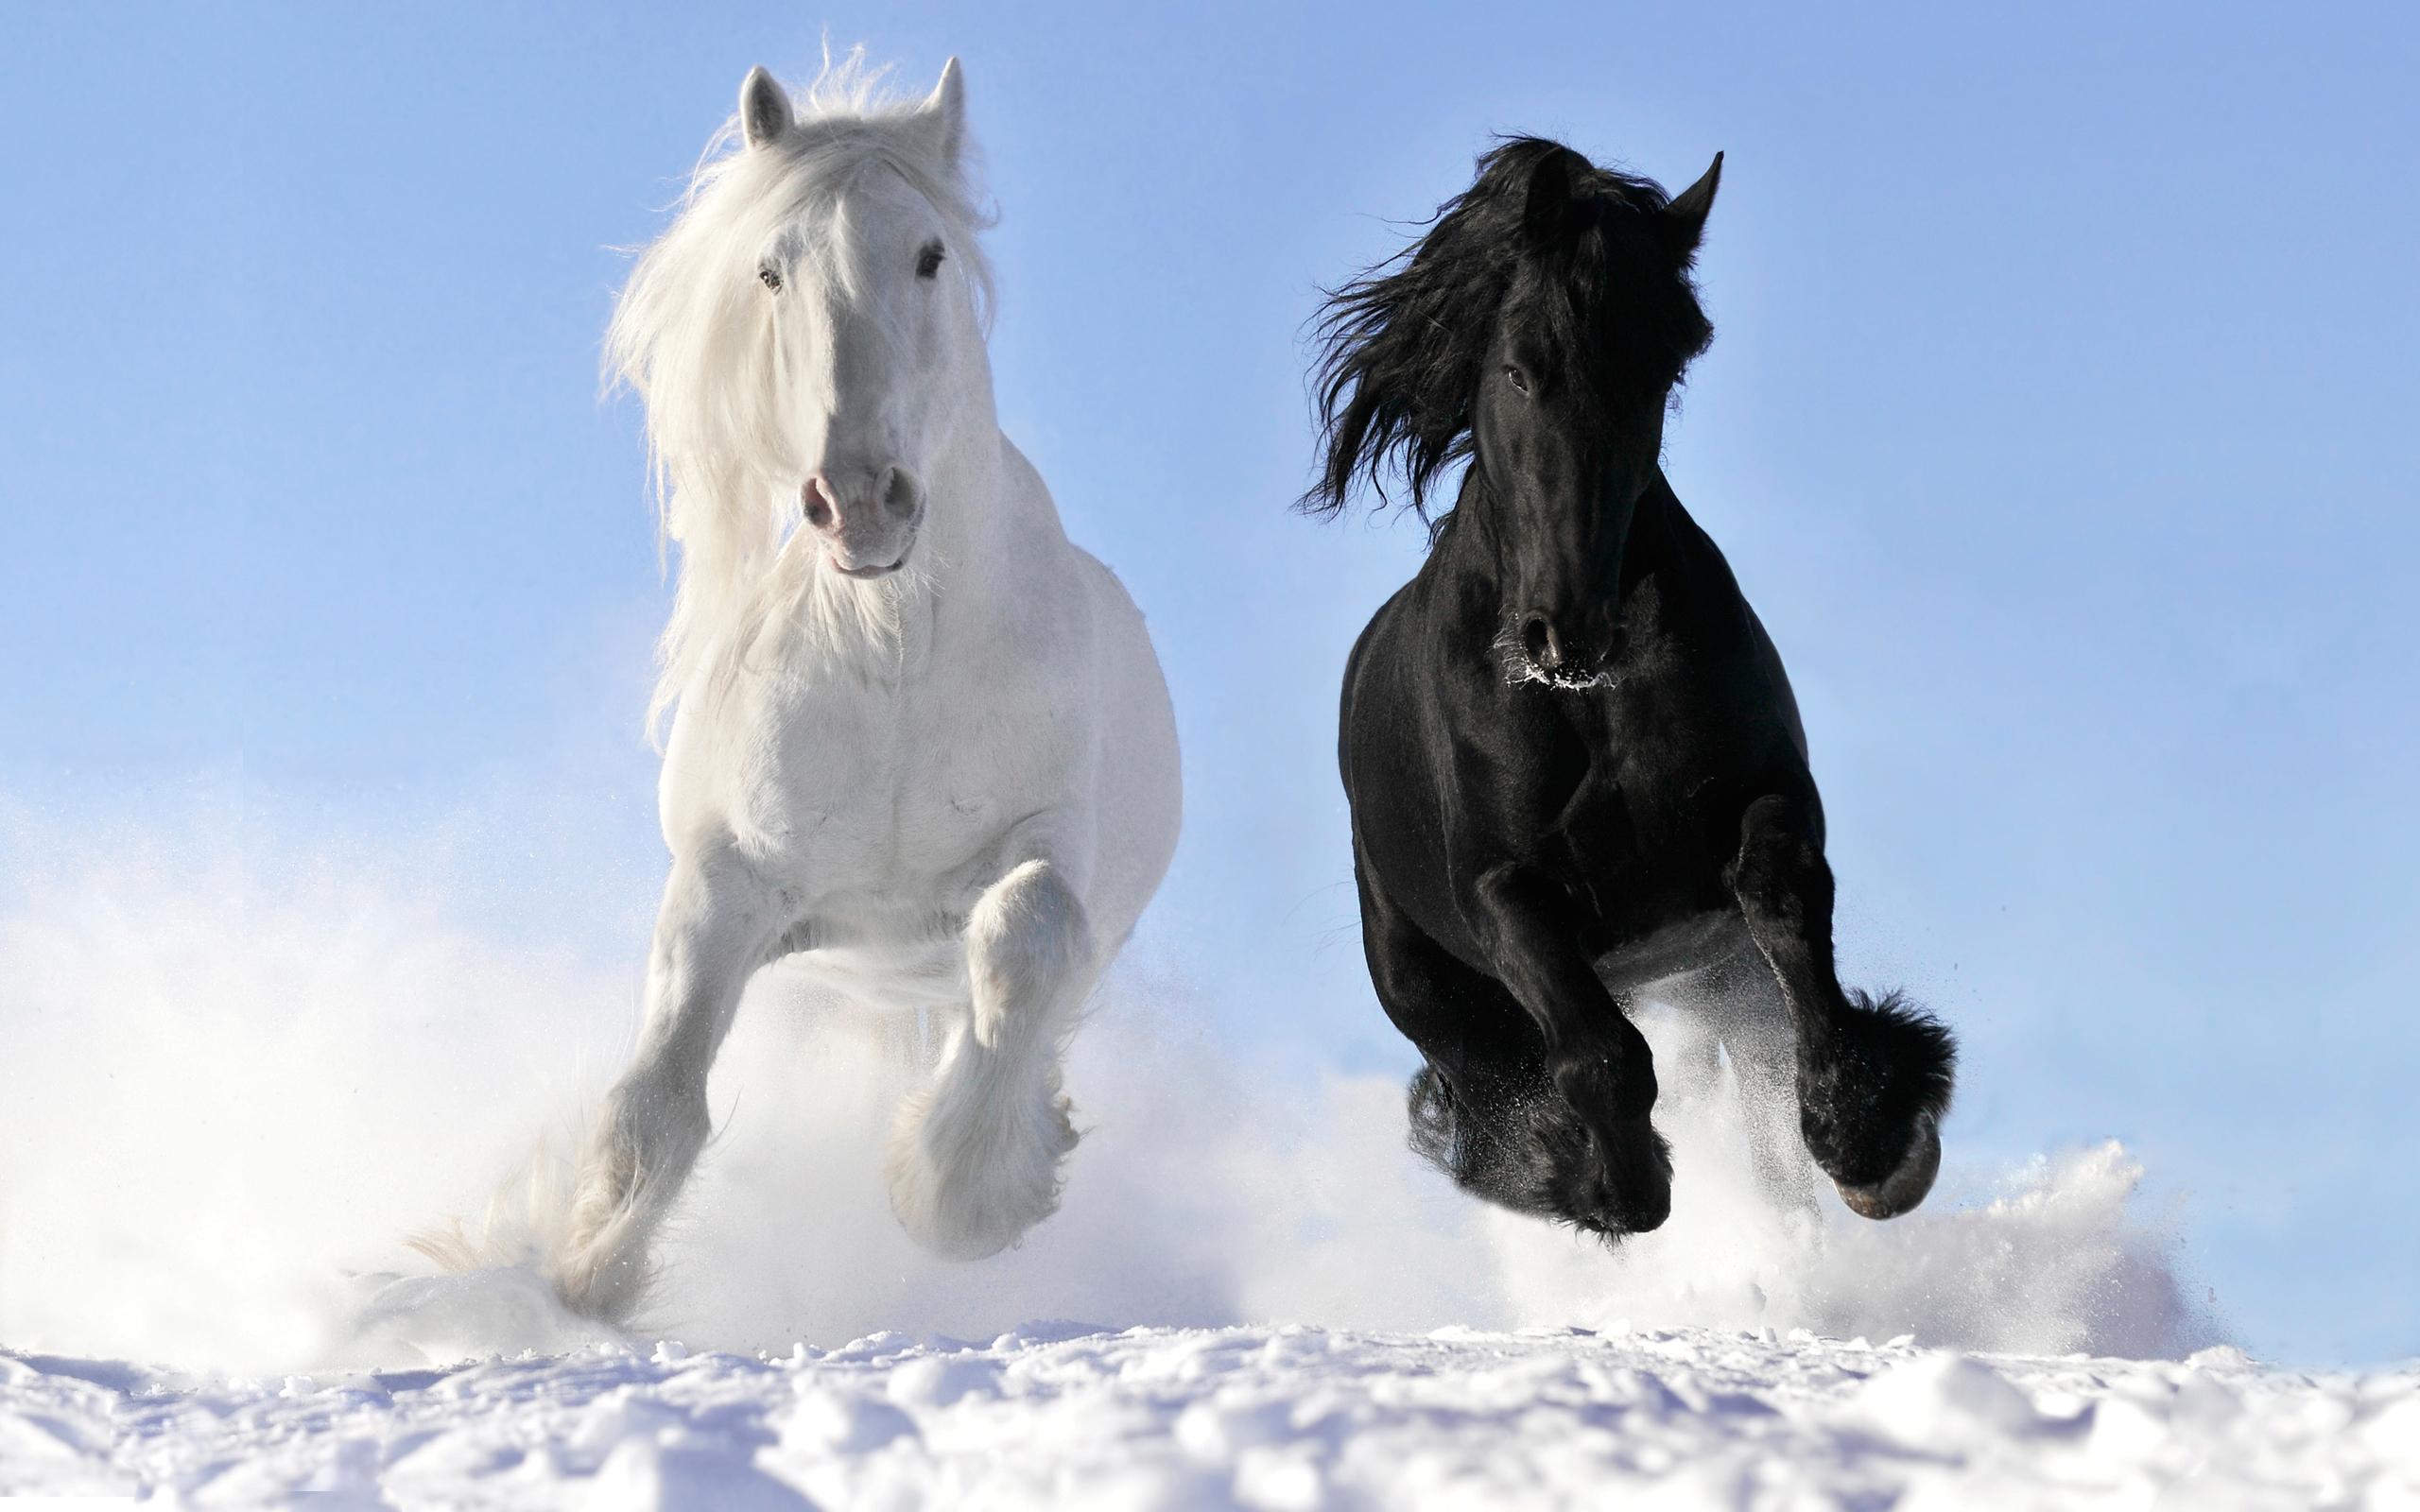 Horses Wallpaper Beautiful Friesian Horse White 2560x1600 Download Hd Wallpaper Wallpapertip